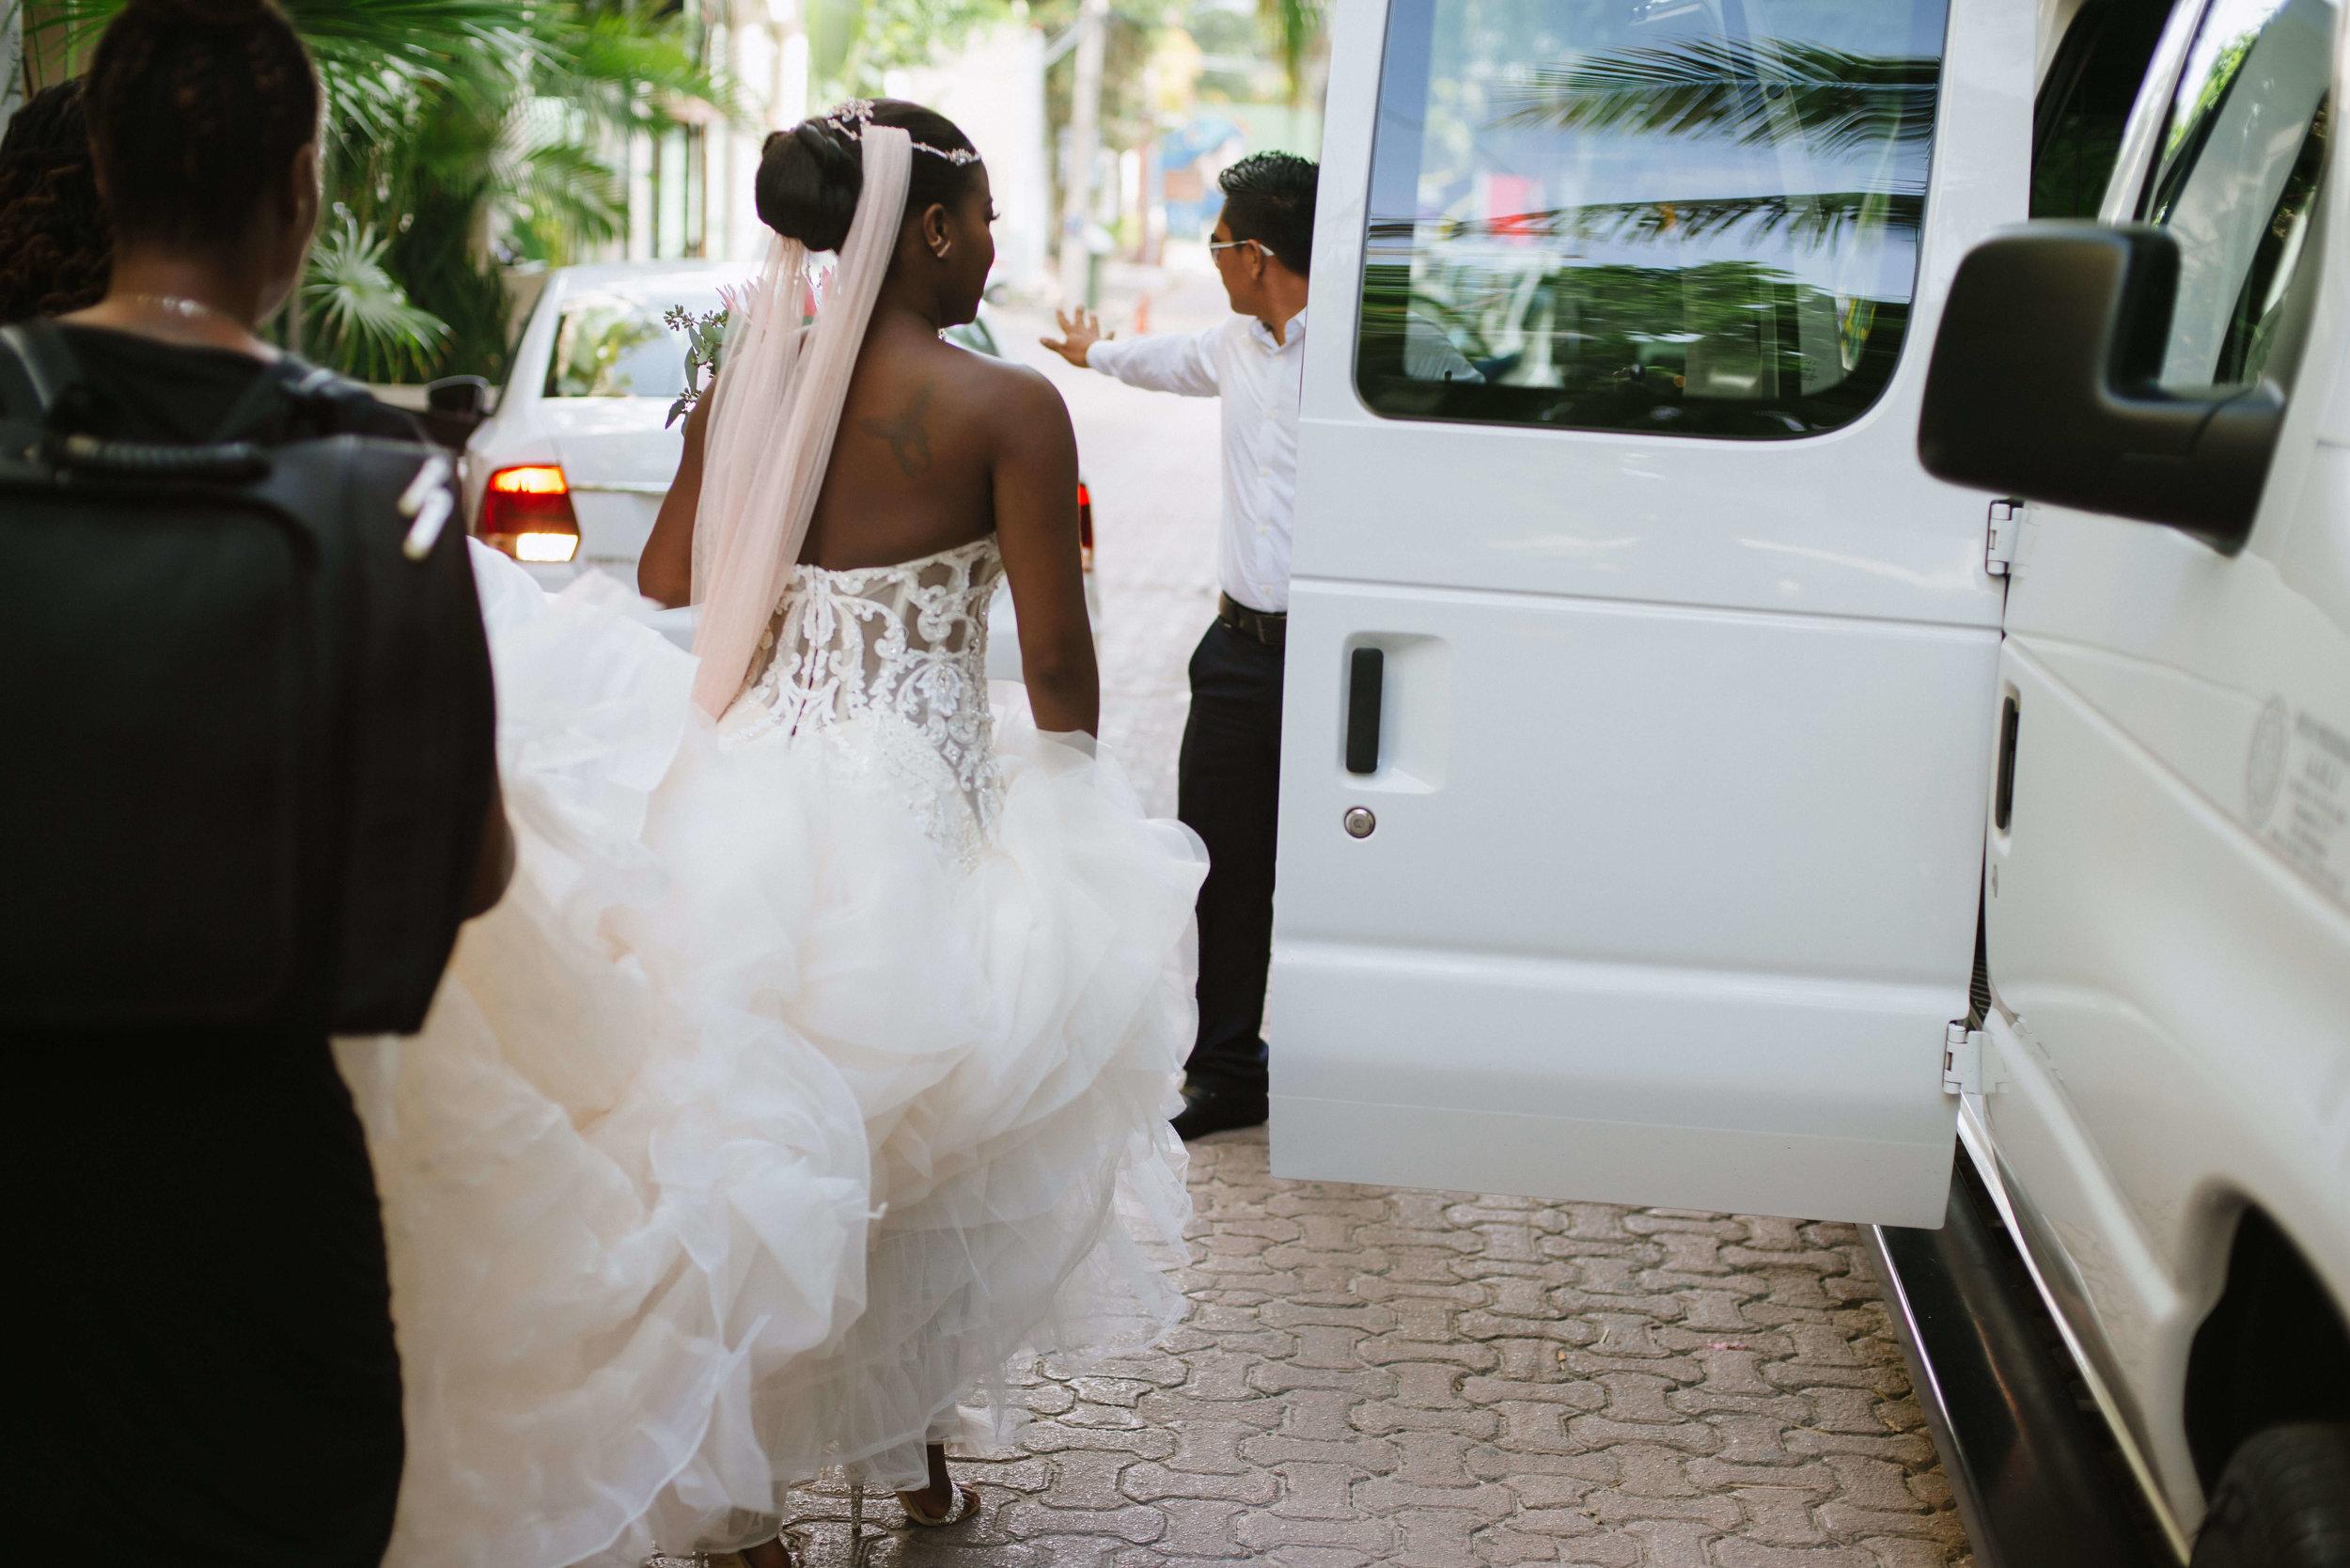 destiland-desti-sweating-for-the-destination-wedding-ready-workouts-2019-back.jpg